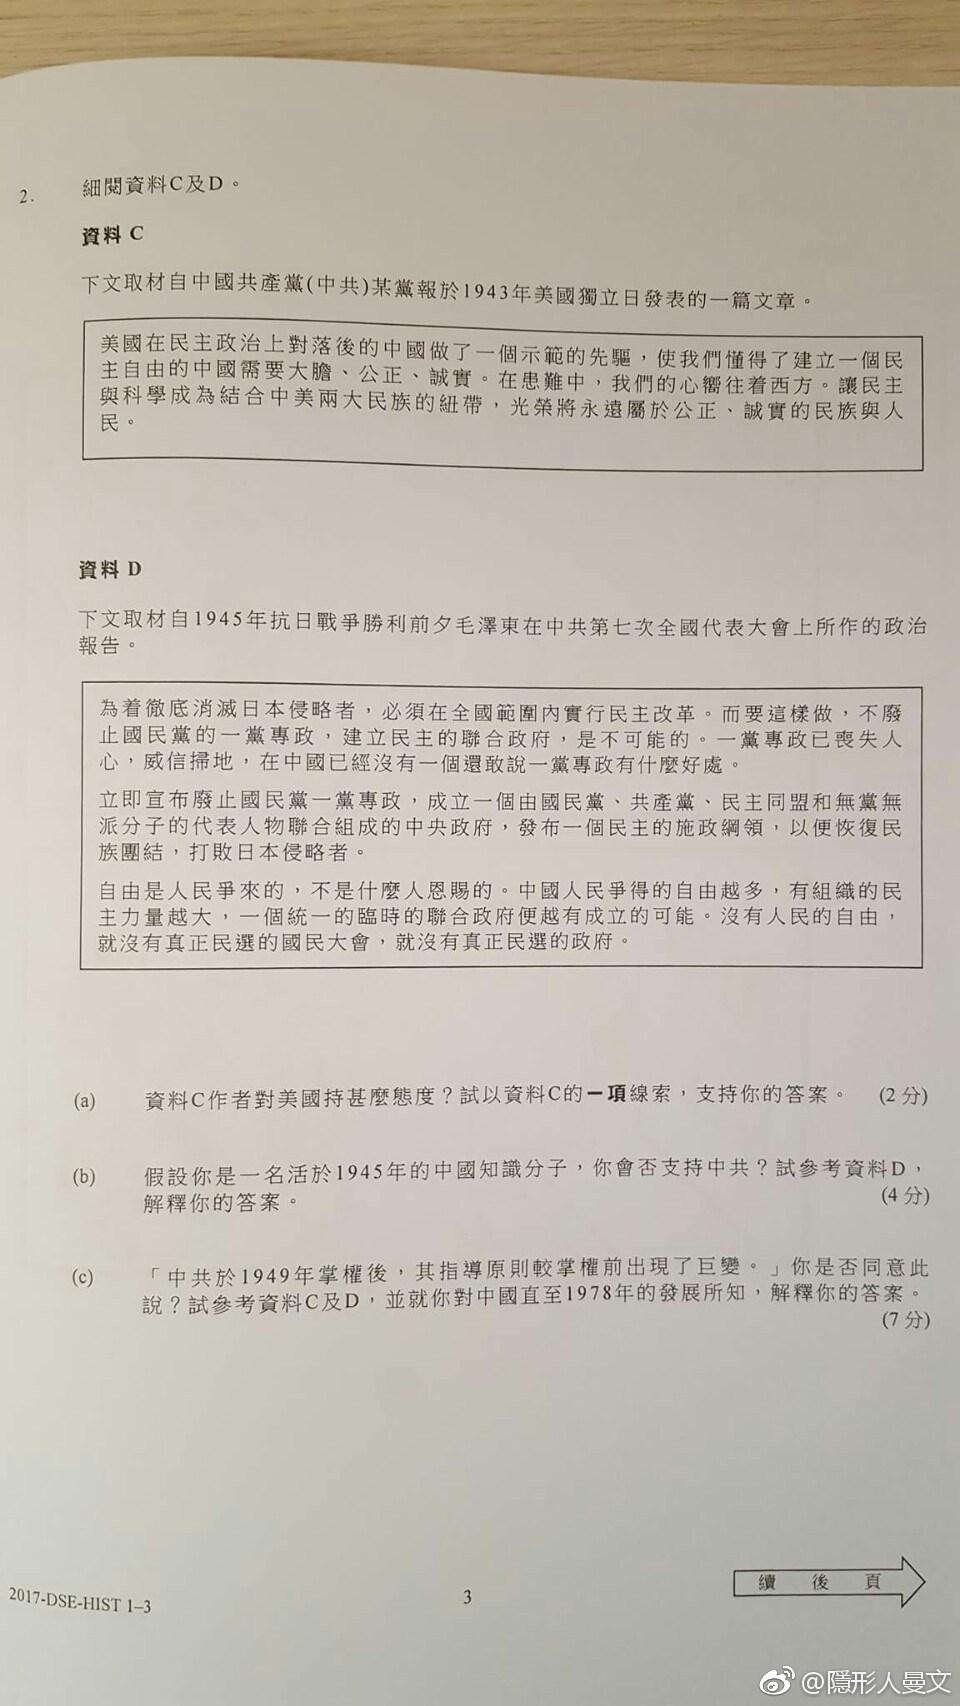 HK Exam Highlights CCP's Stance on Democracy